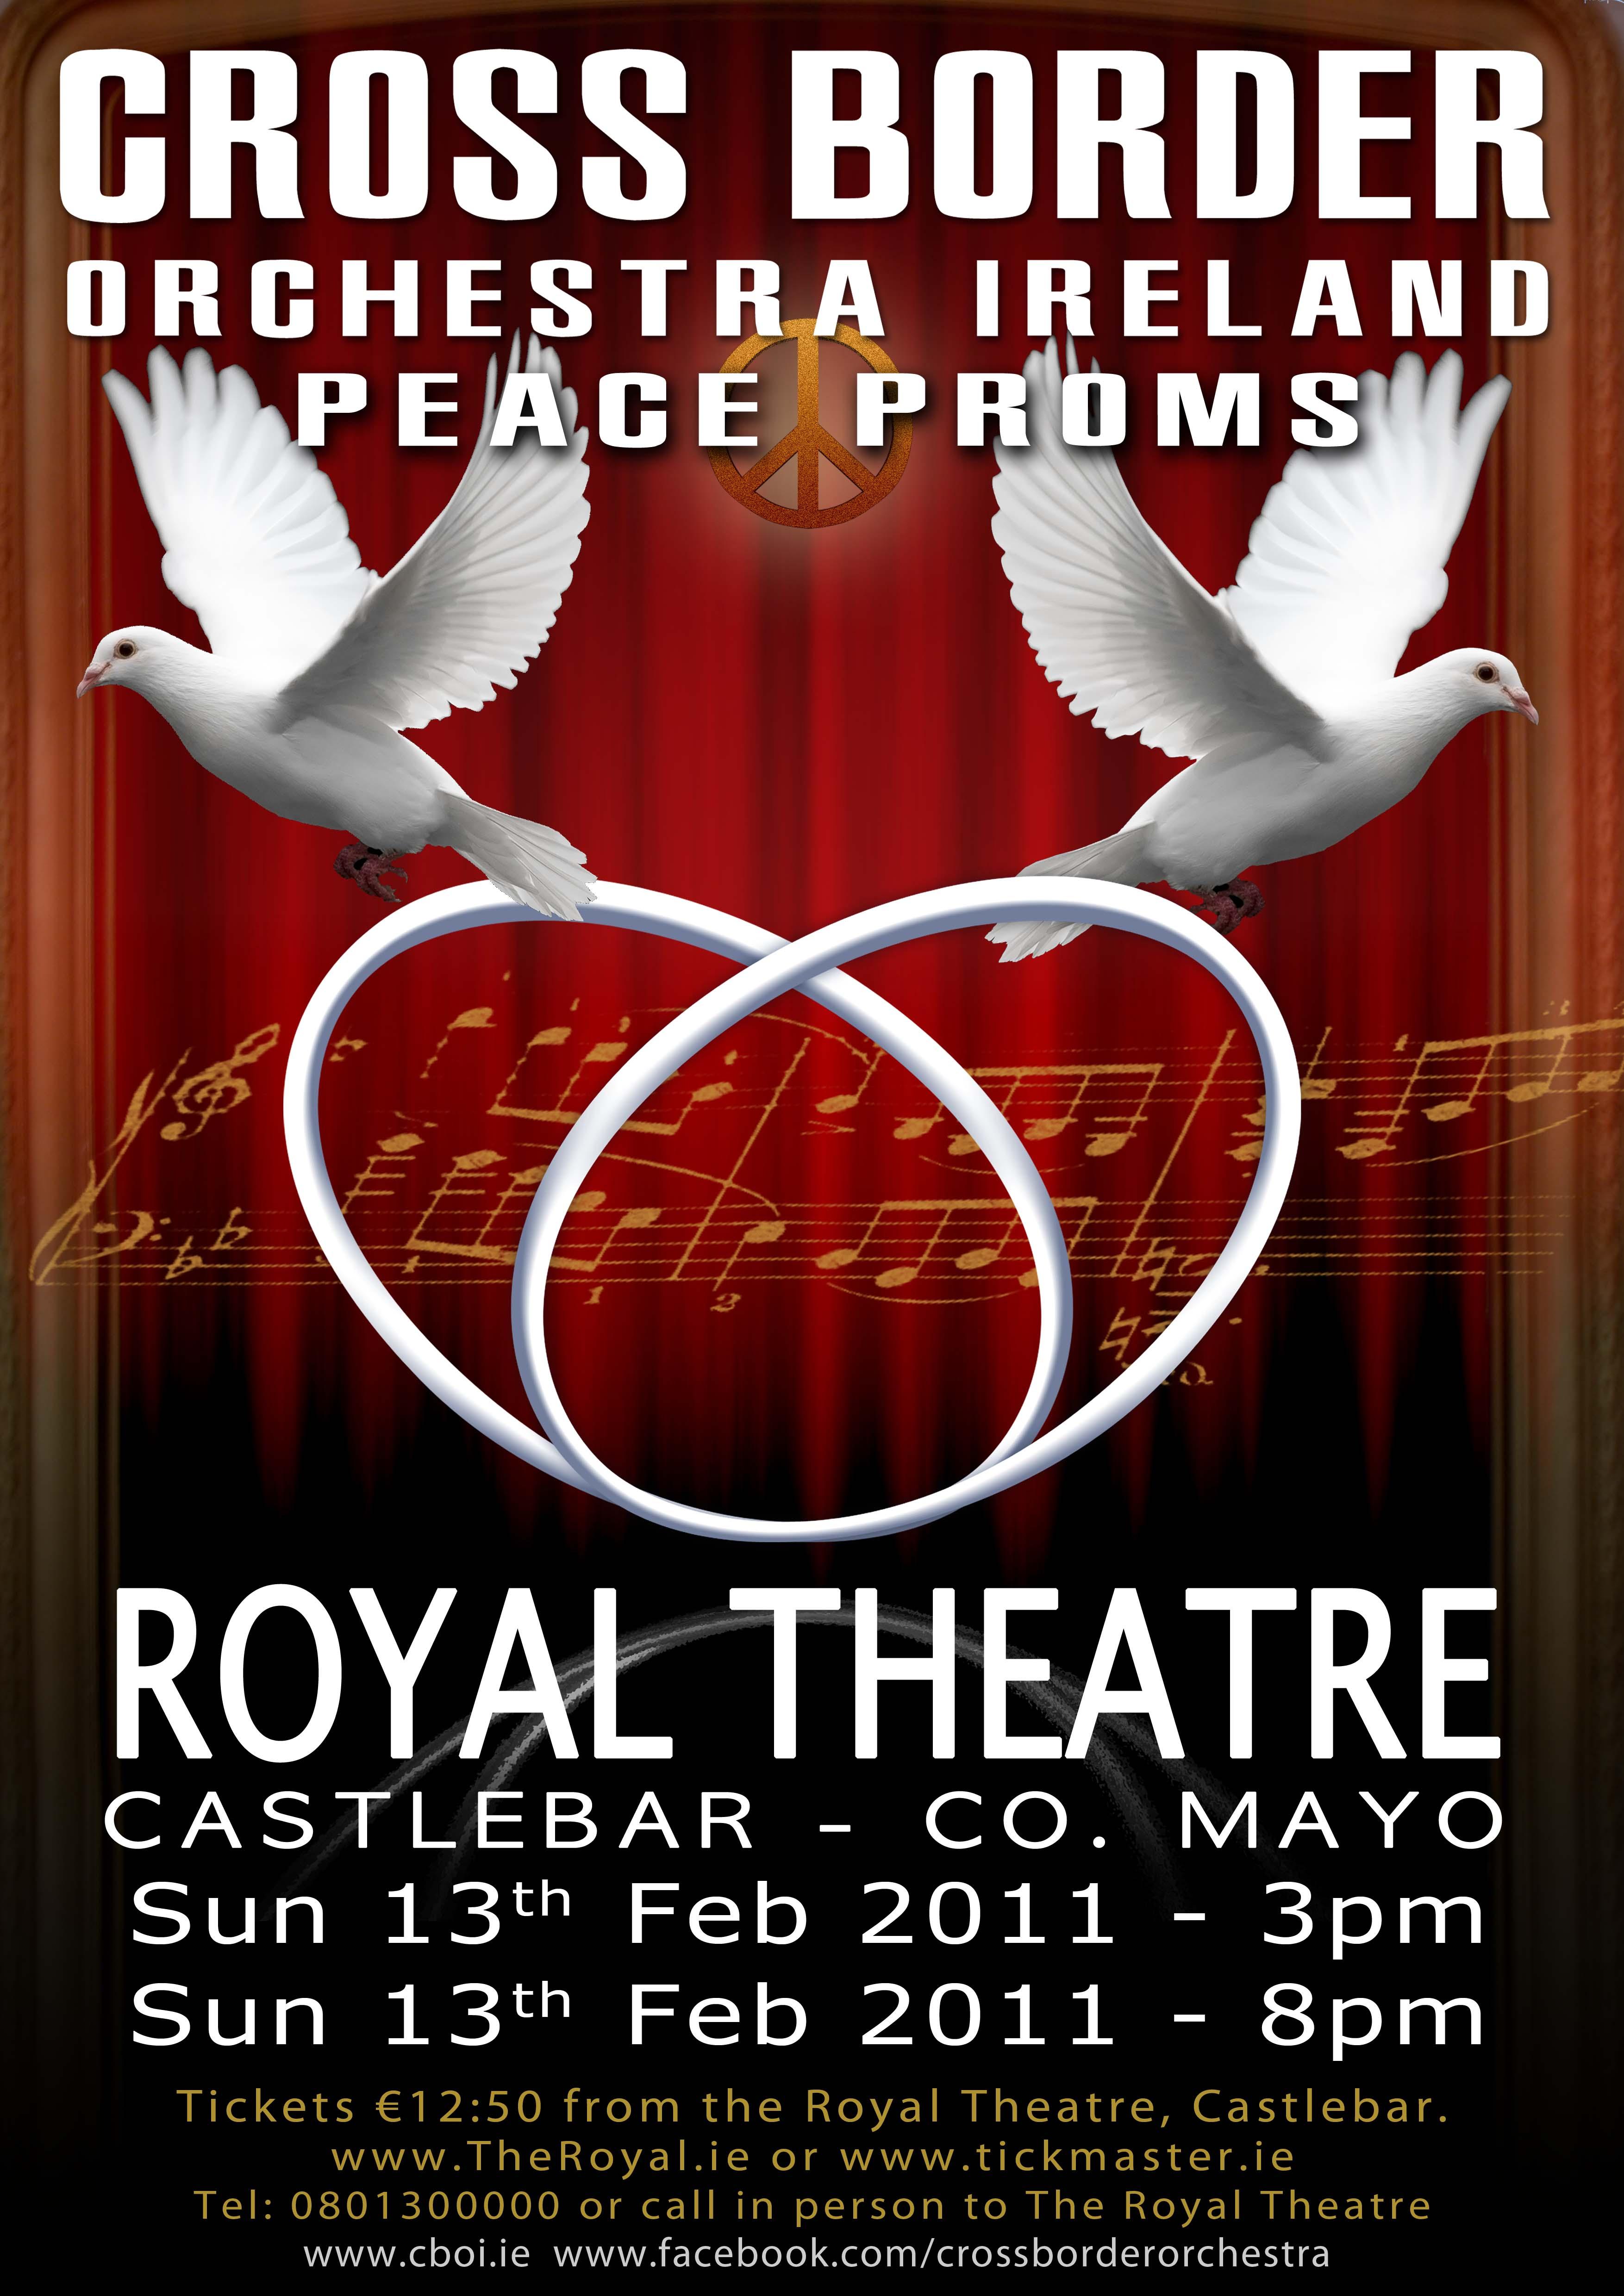 Mayo_Proms_Poster.jpg